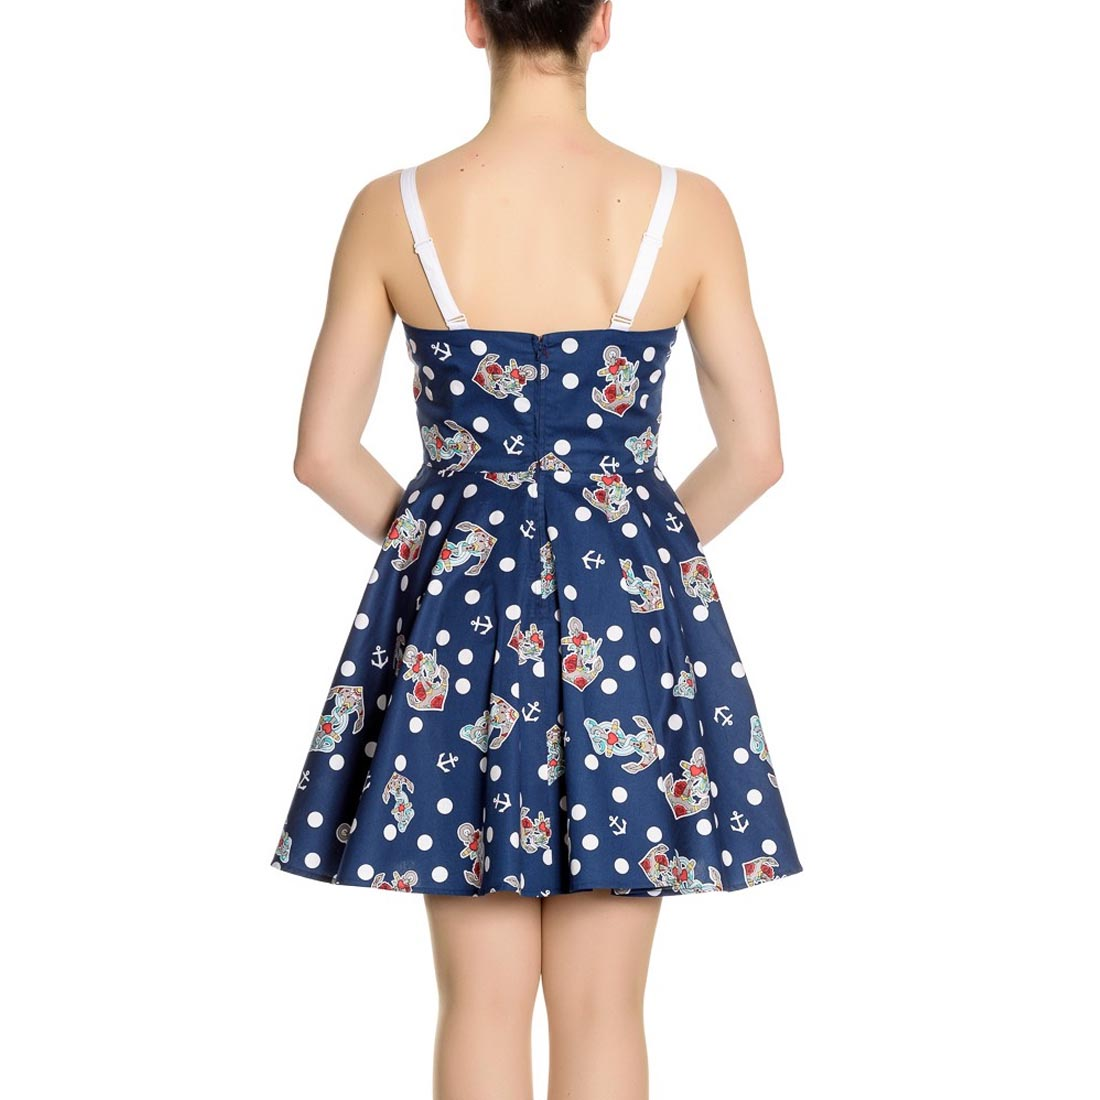 Hell-Bunny-Navy-Blue-50s-Nautical-Mini-Dress-OCEANA-Polka-Dot-All-Sizes thumbnail 29